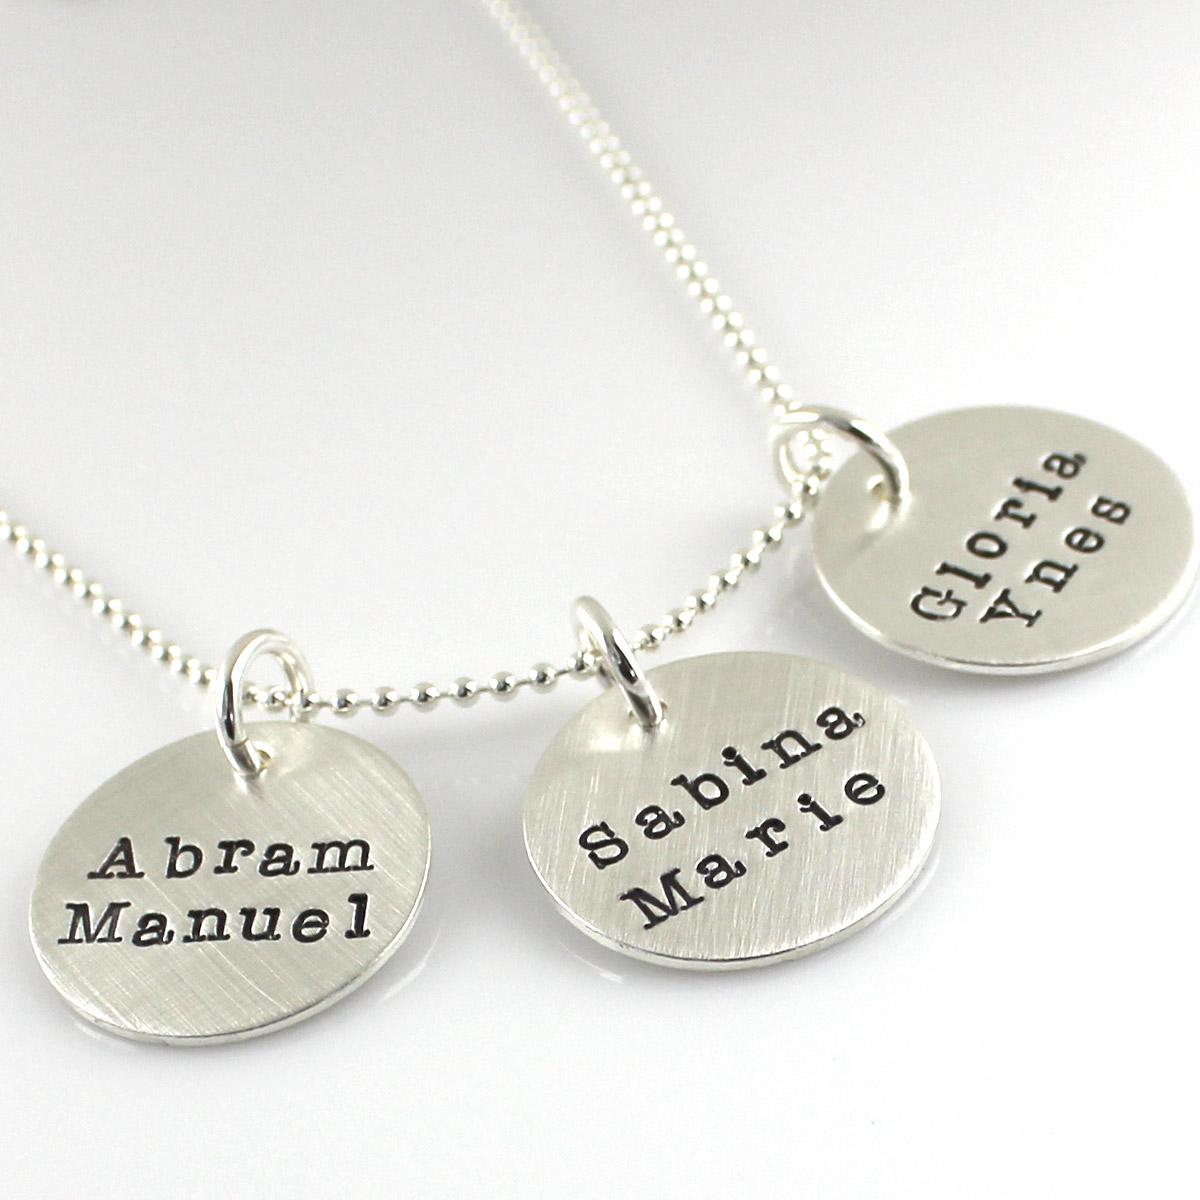 Simple Name Necklace - Three Discs